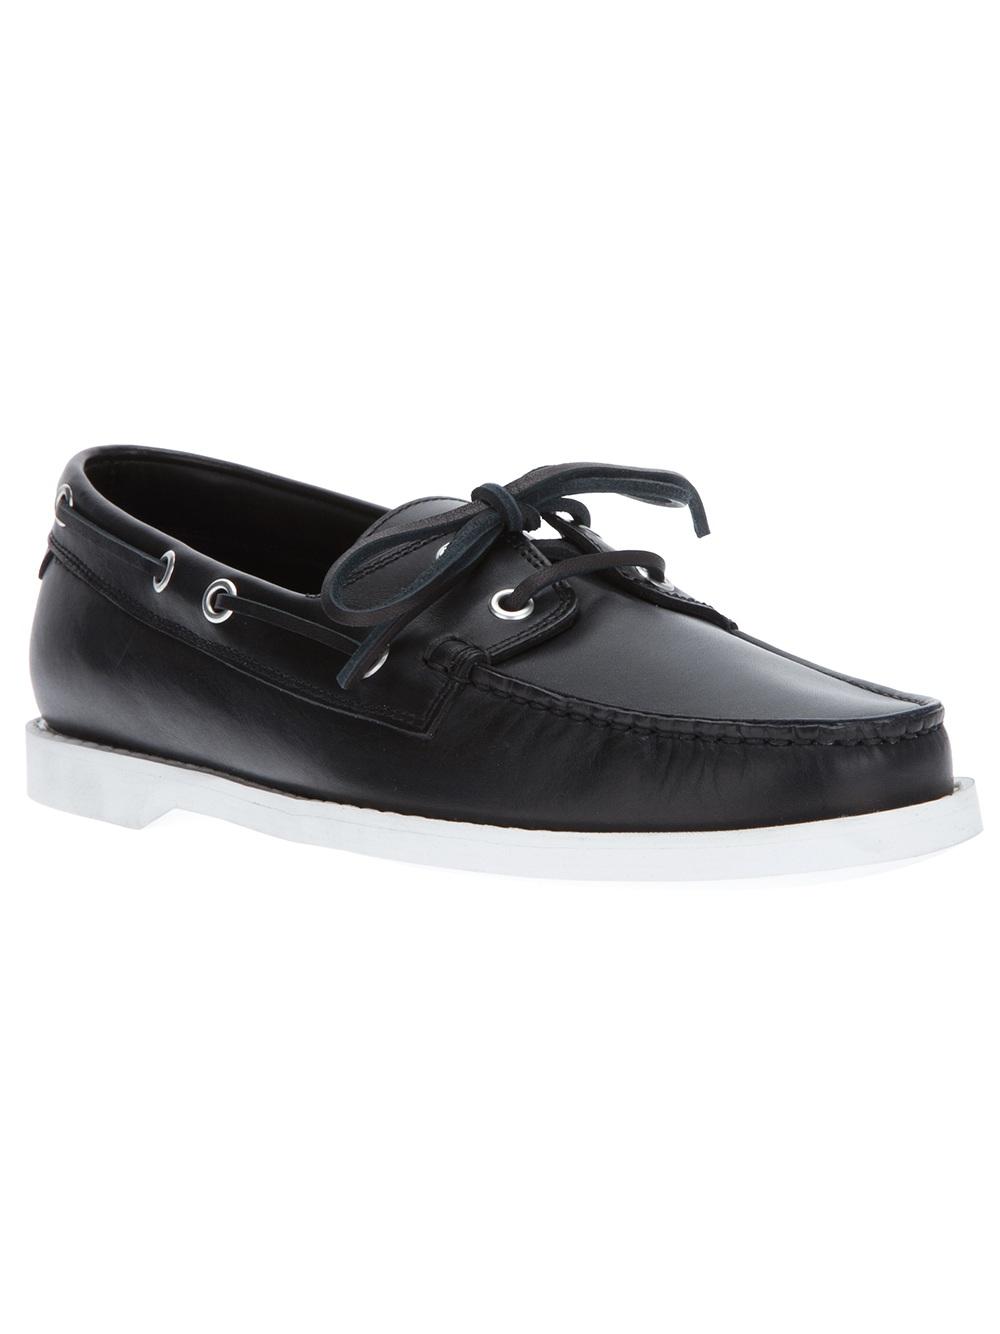 Lyst Saint Laurent Deck Shoe In Black For Men